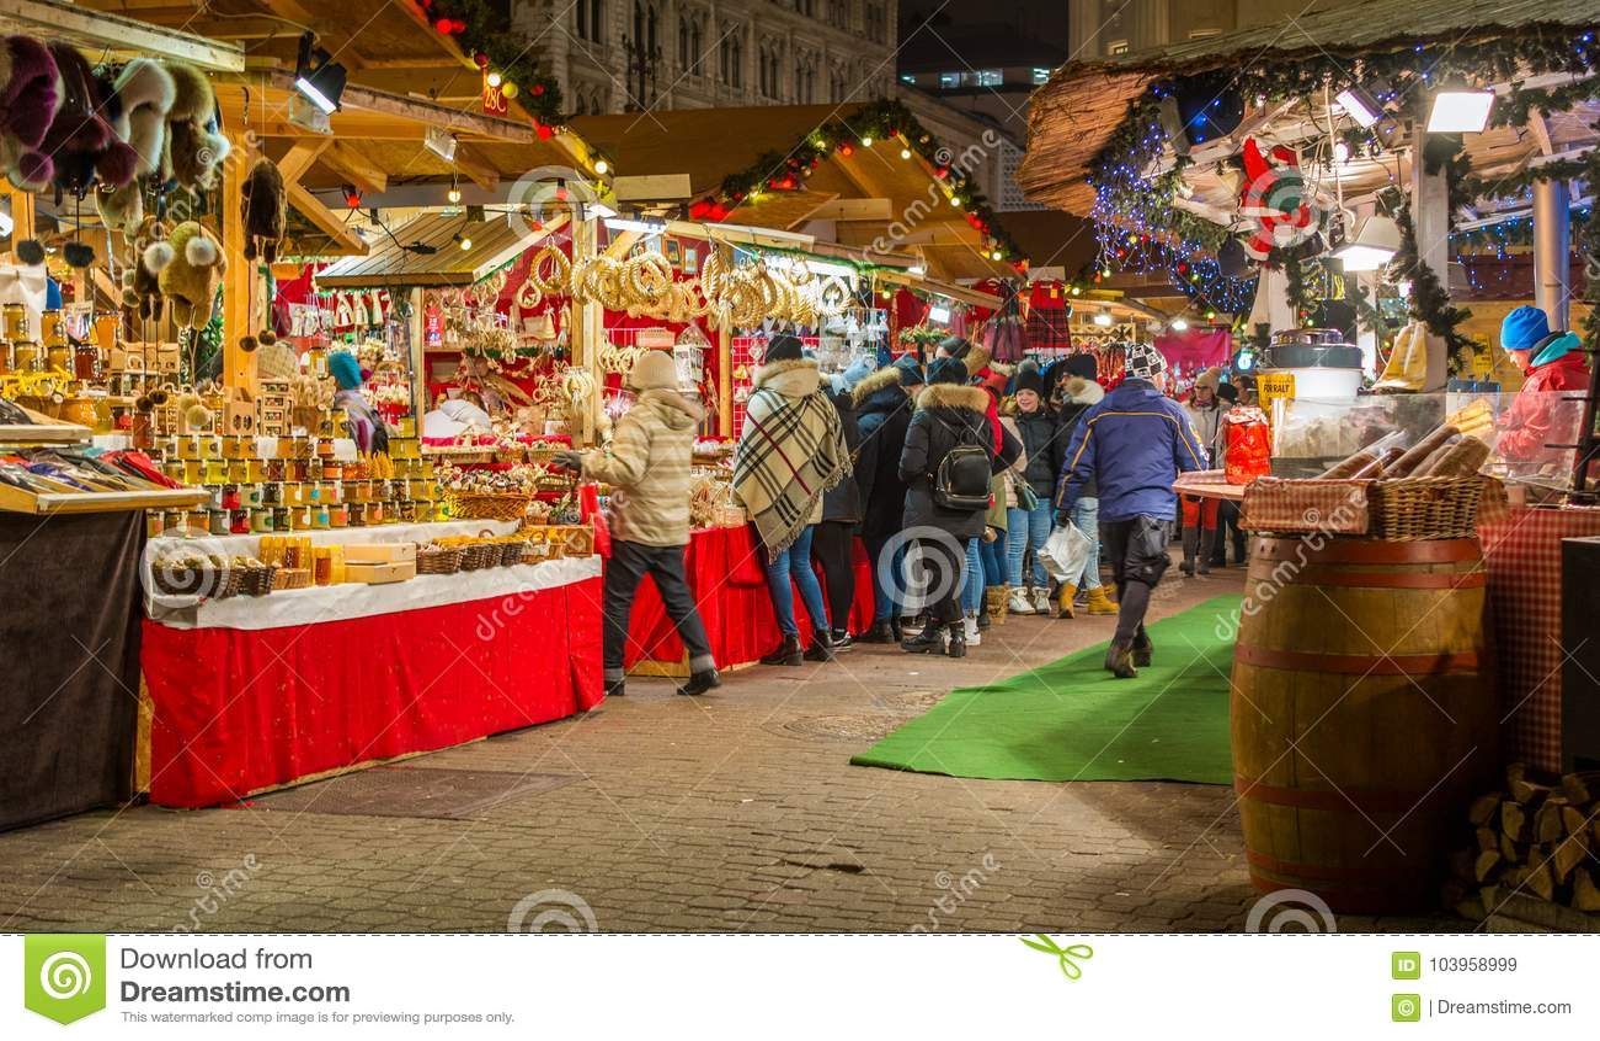 Vorosmarty Square Budapest Christmas Market.Christmas Market In Vorosmarty Square In Budapest Hungary